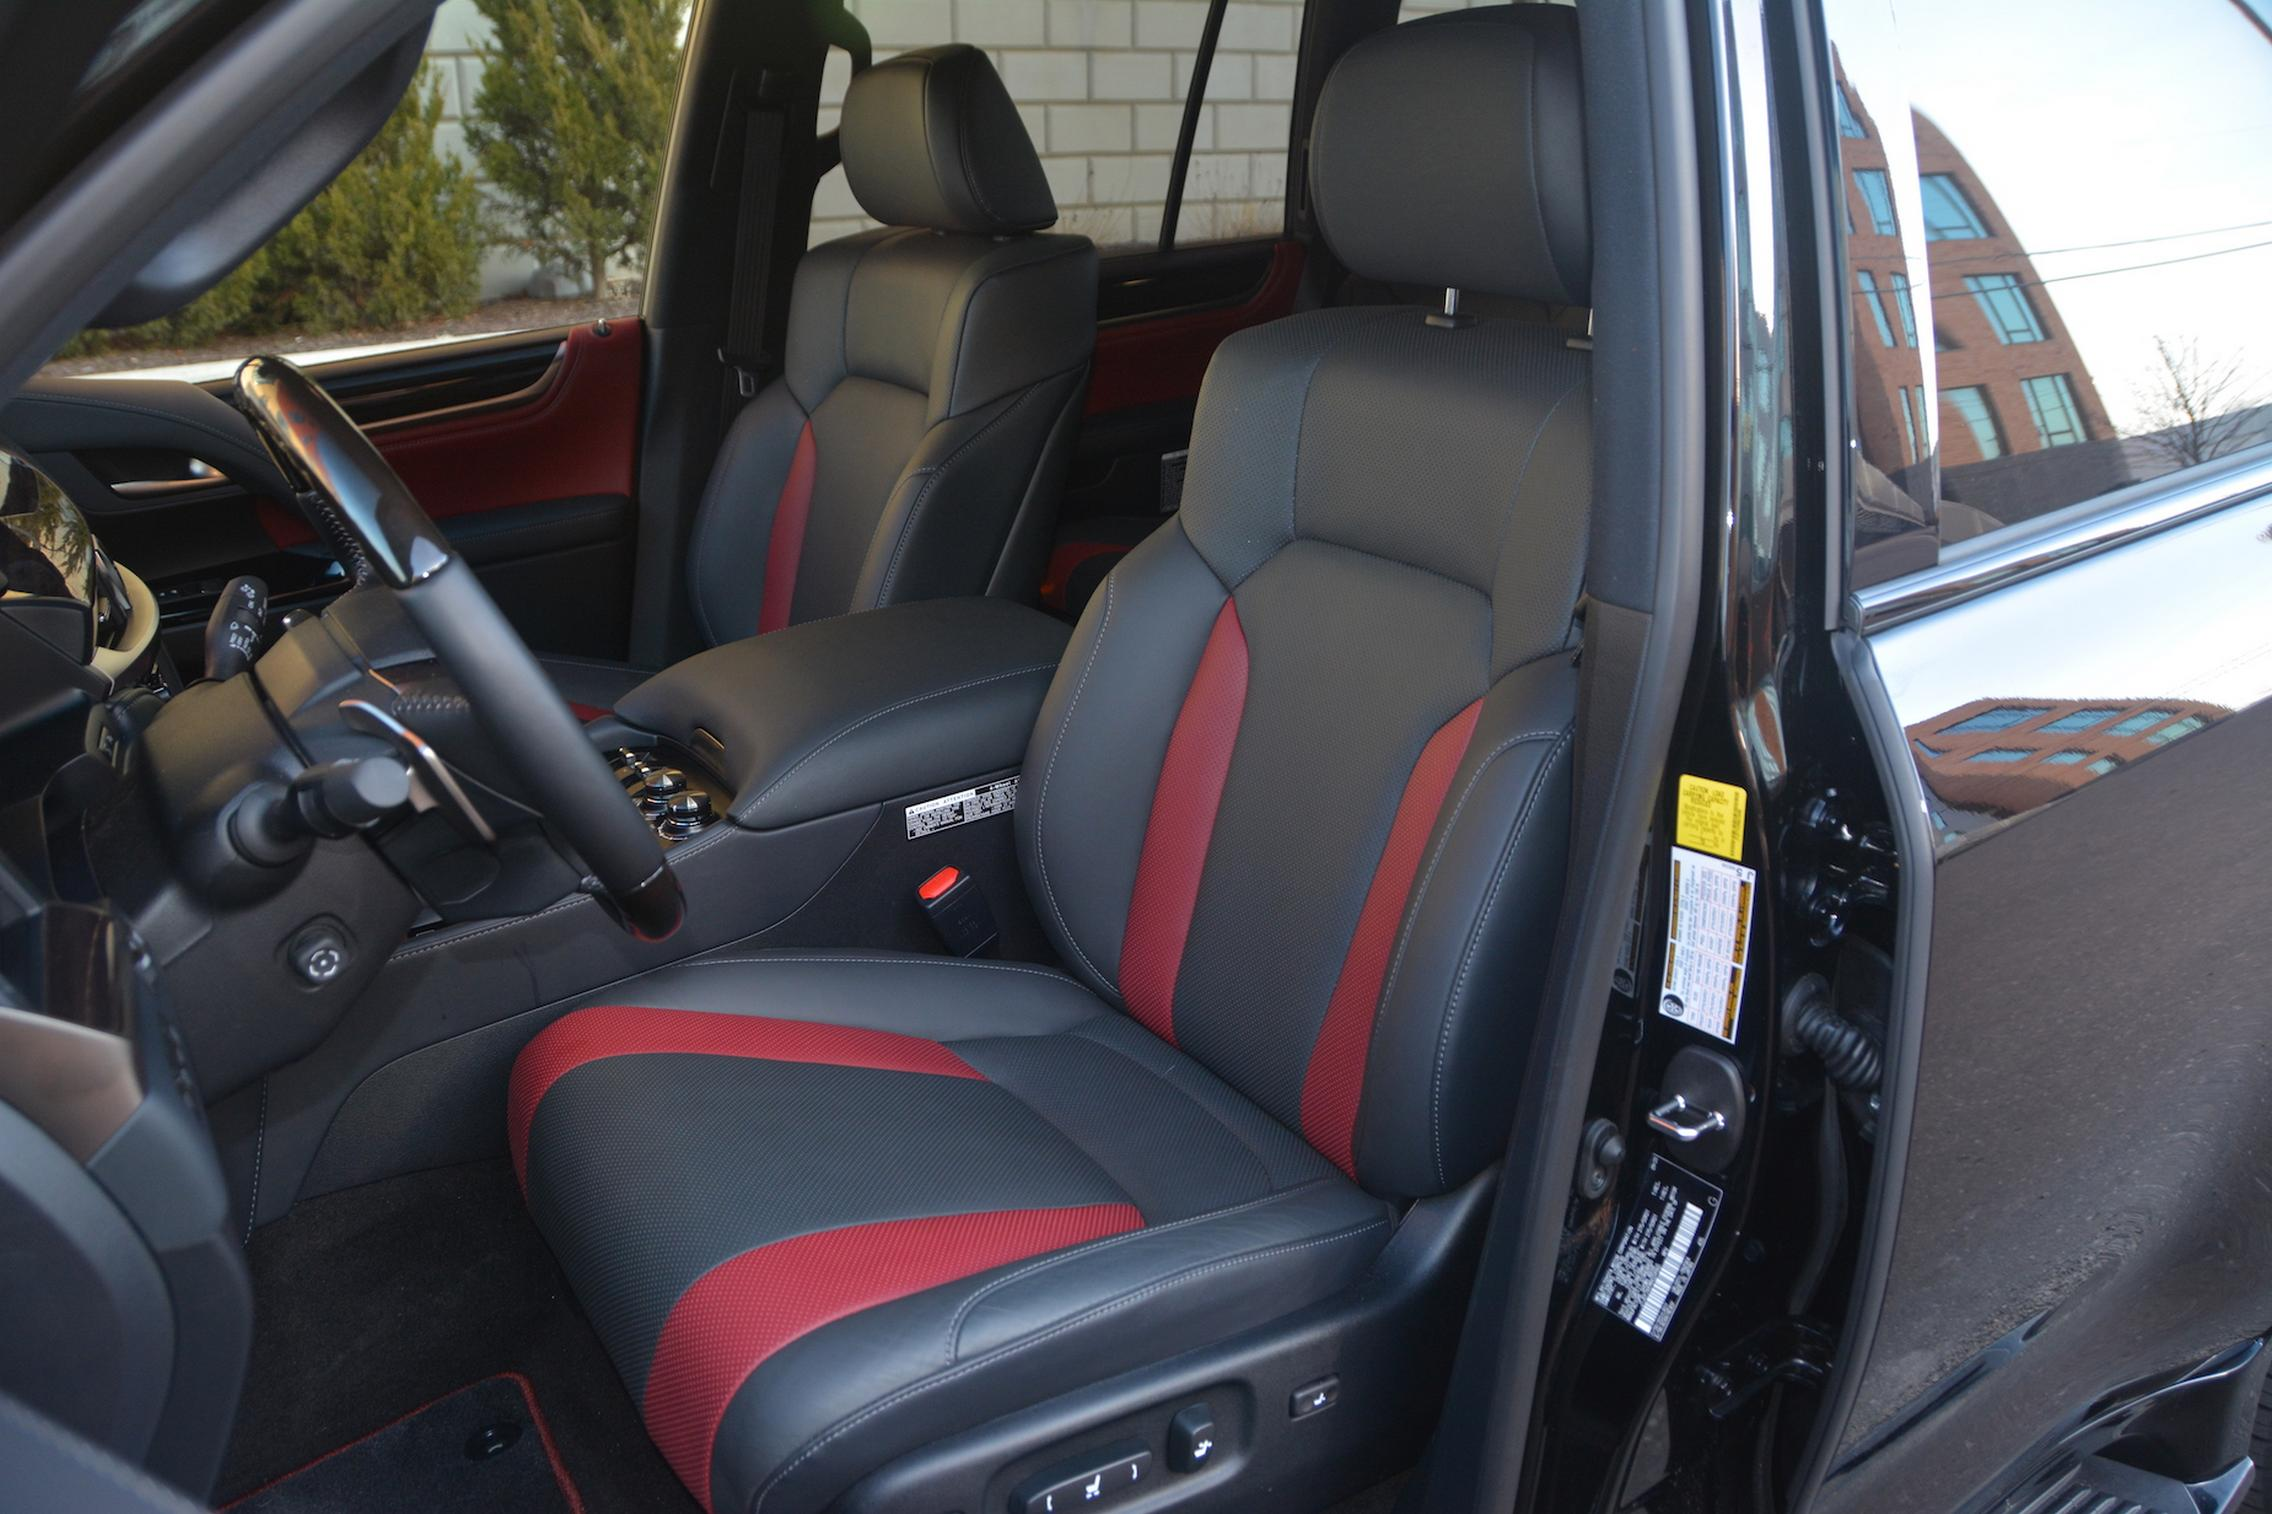 2021 Lexus LX570 seats